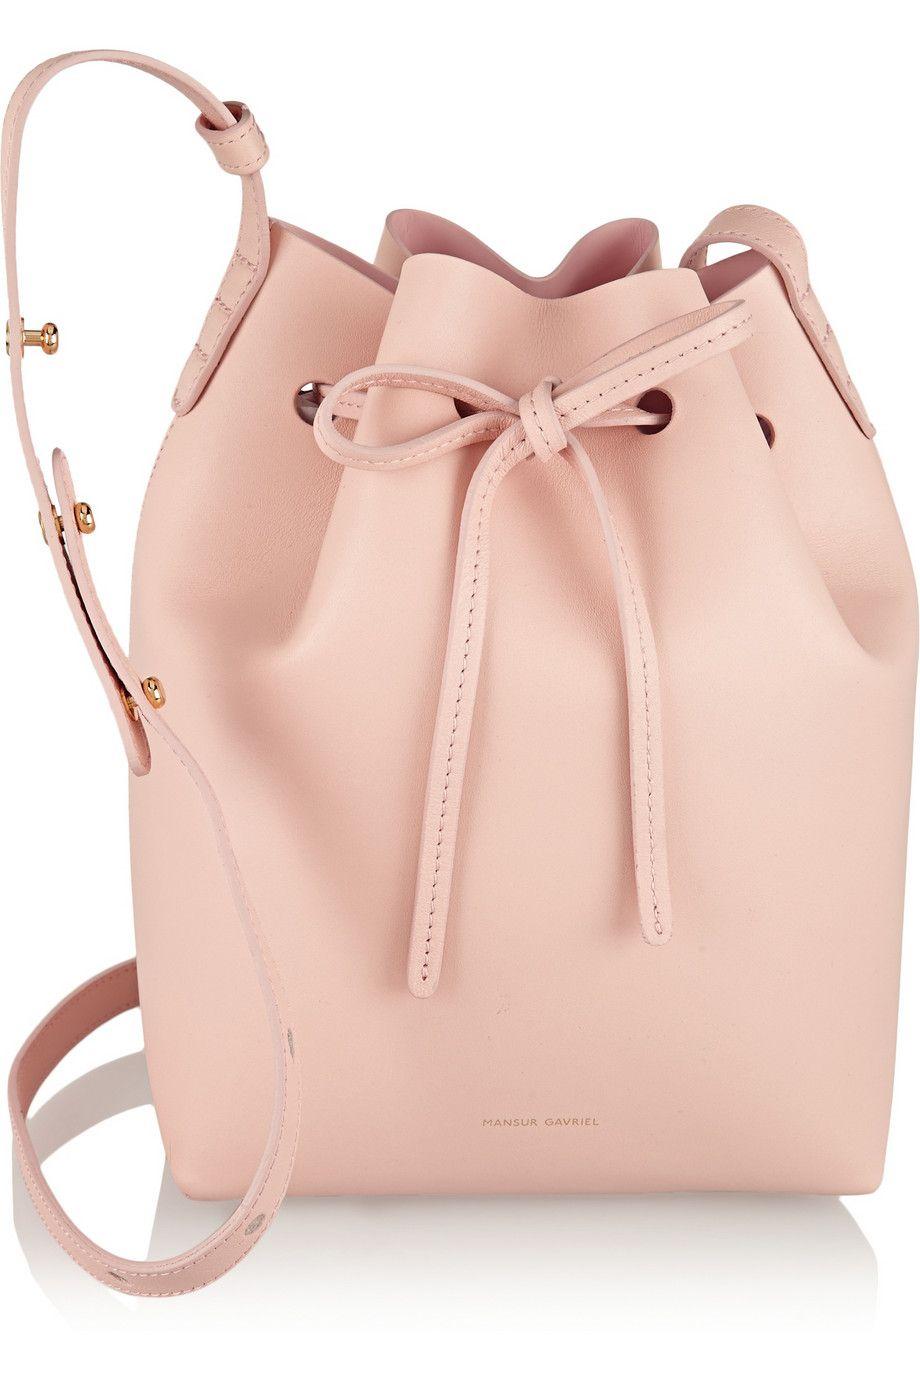 Mansur Gavriel|Mini leather bucket bag|NET-A-PORTER.COM